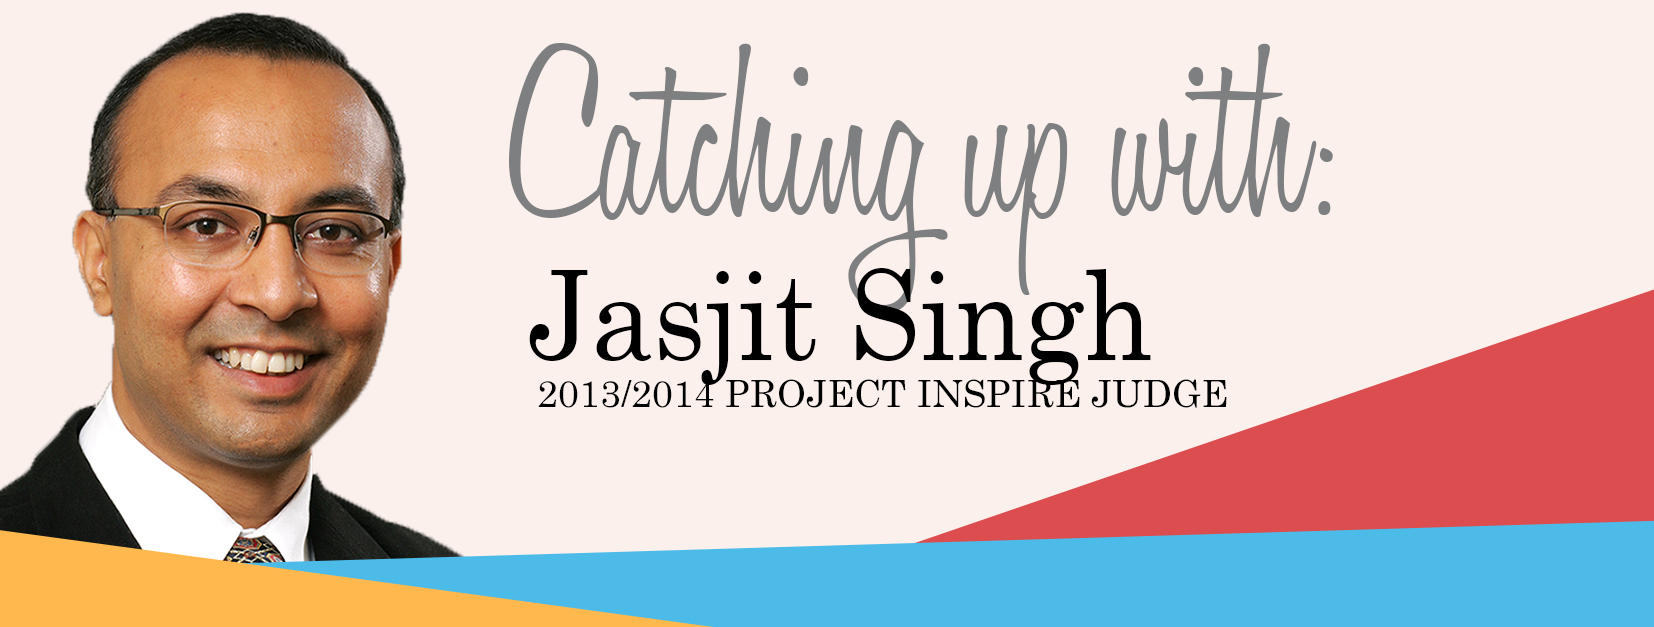 Judge - Jasjit Singh